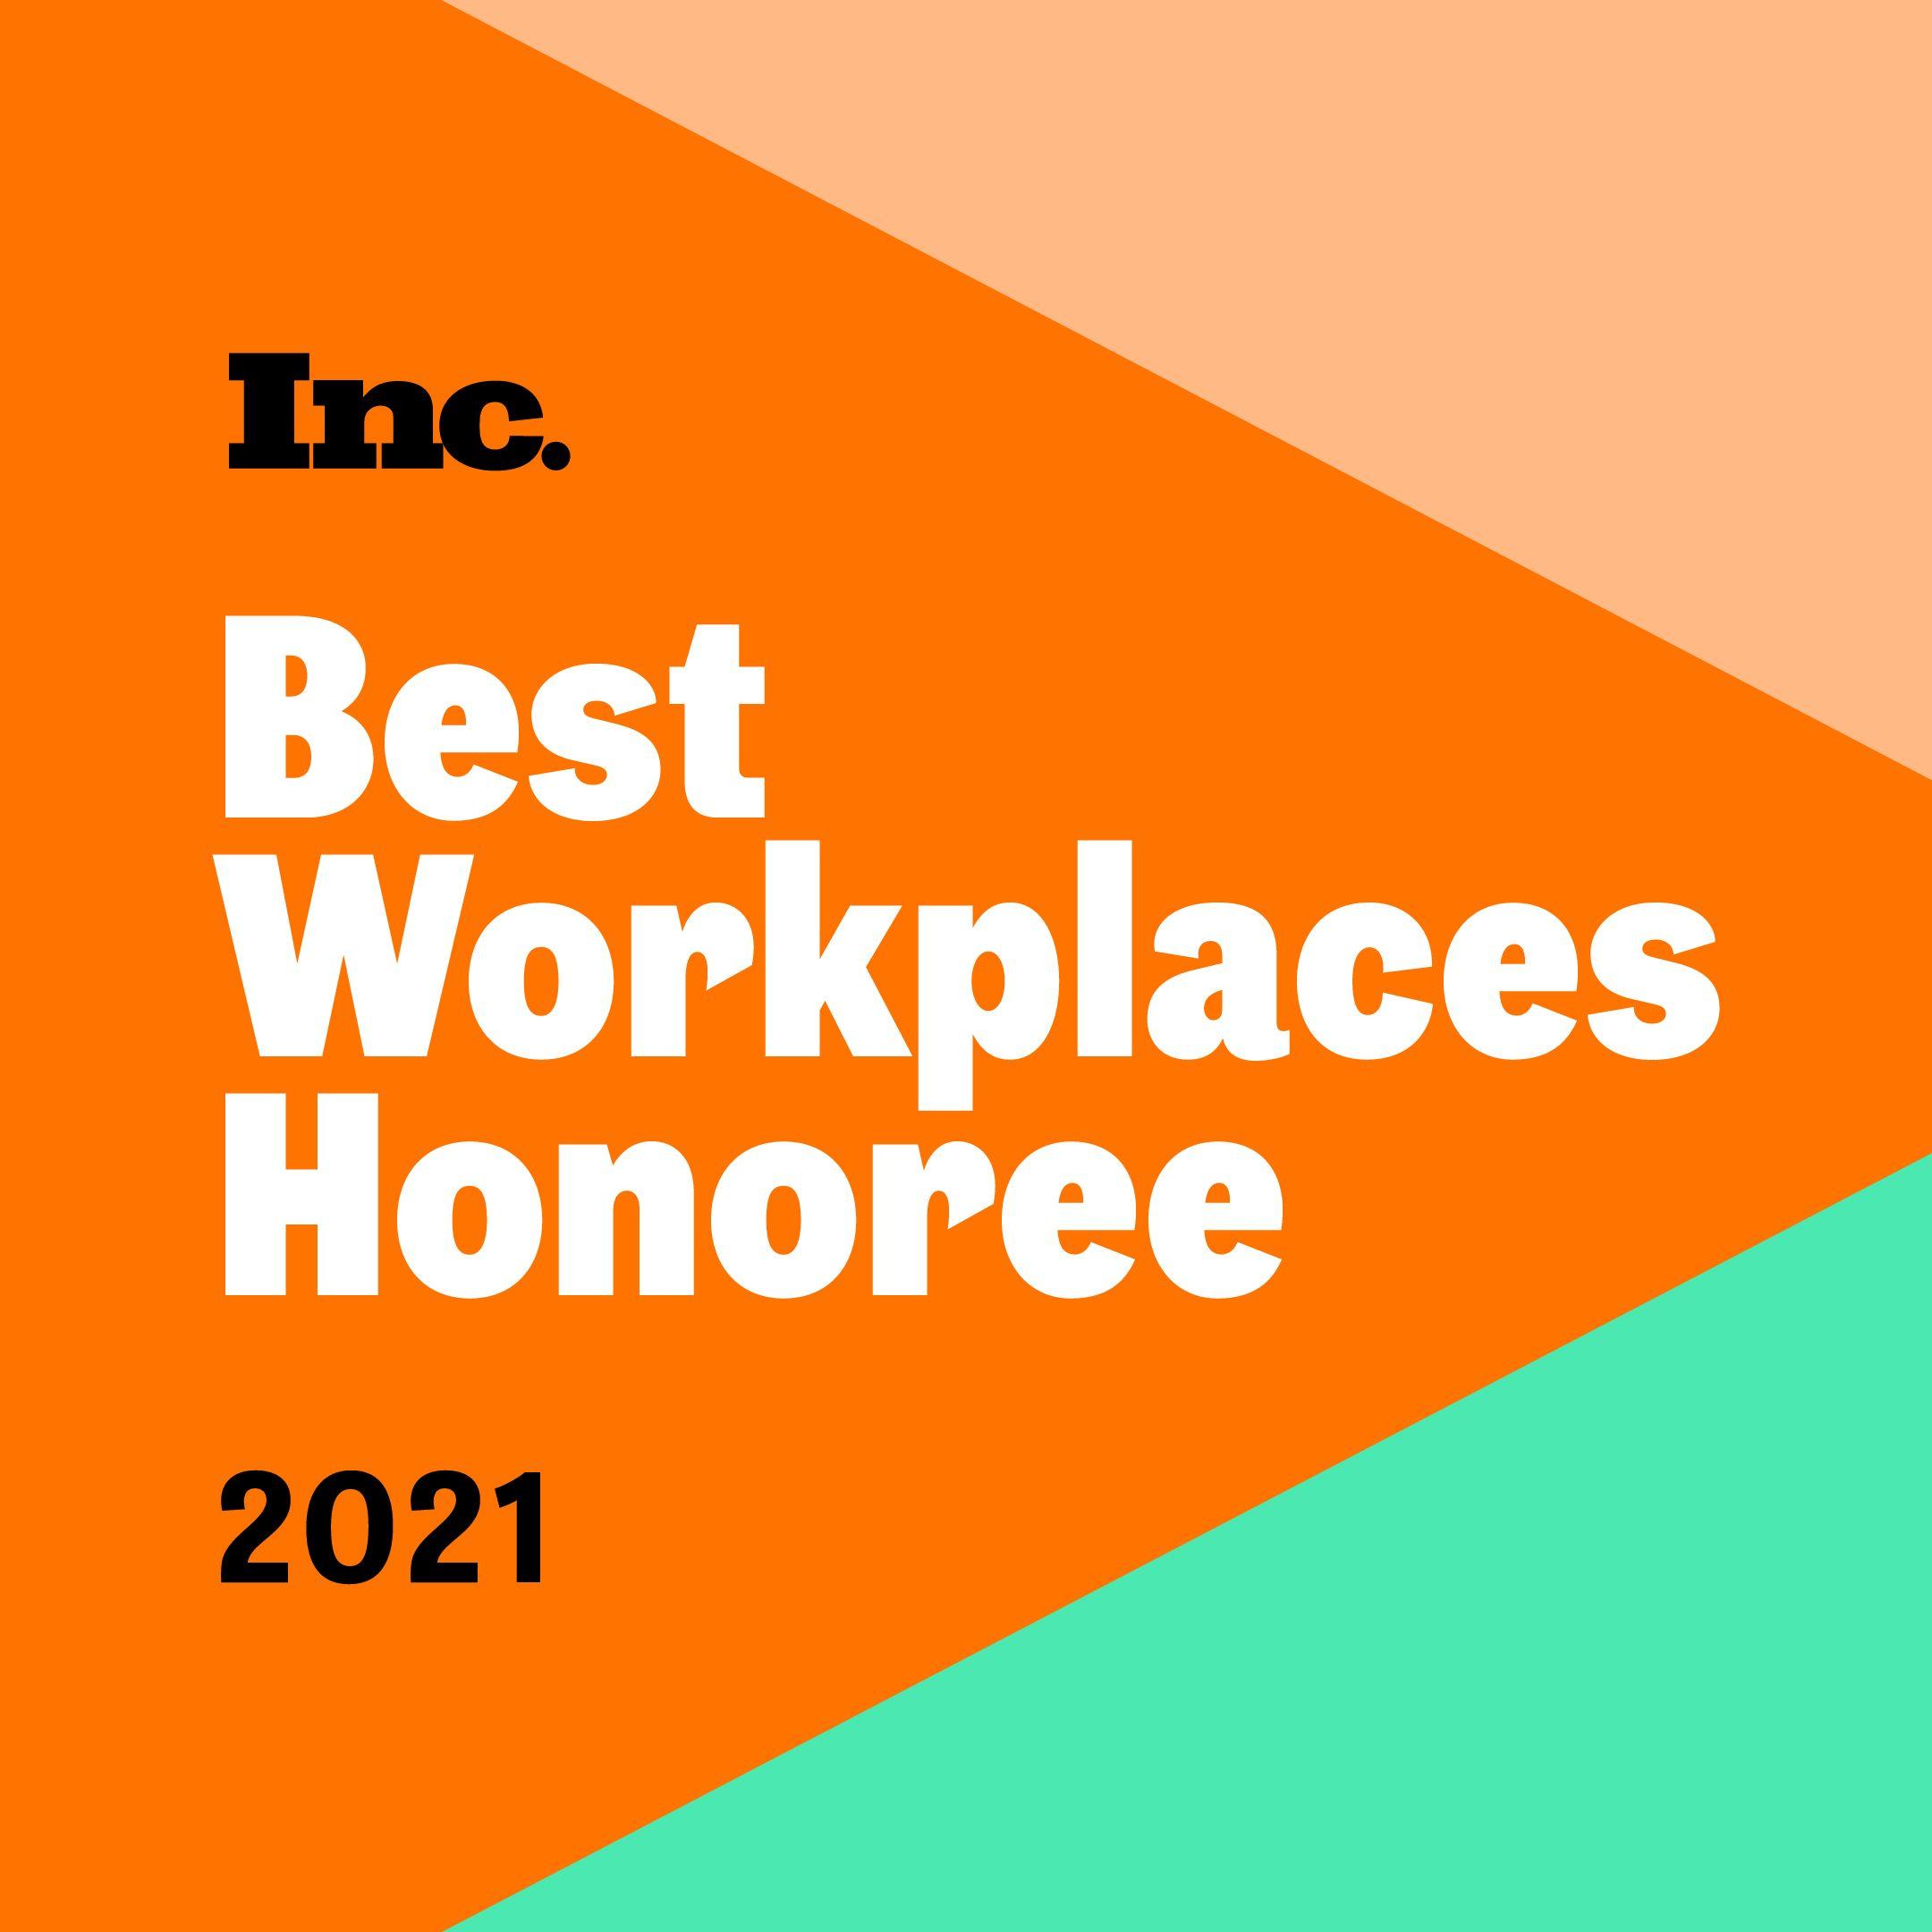 Best Workplaces Honoree 2021